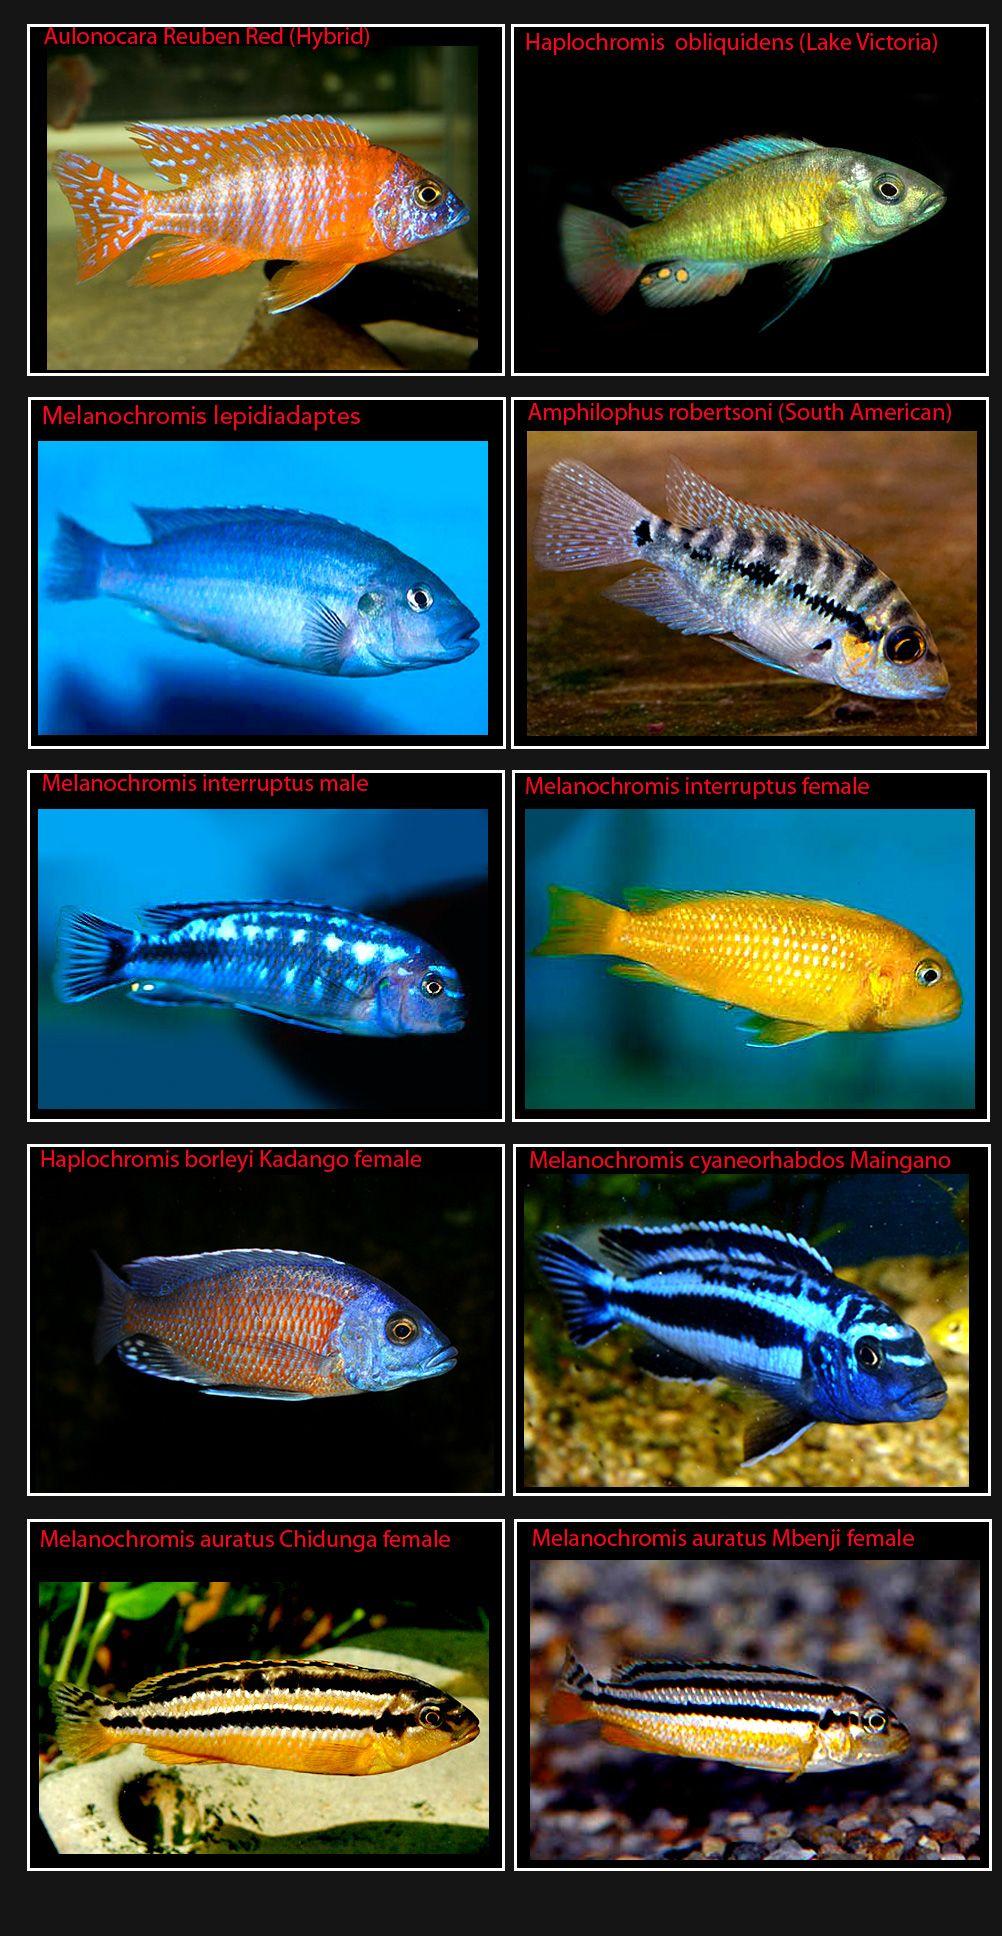 Cichlids Page 6 Pics Only4 Jpg 1002 1936 Cichlids African Cichlid Aquarium Aquarium Fish